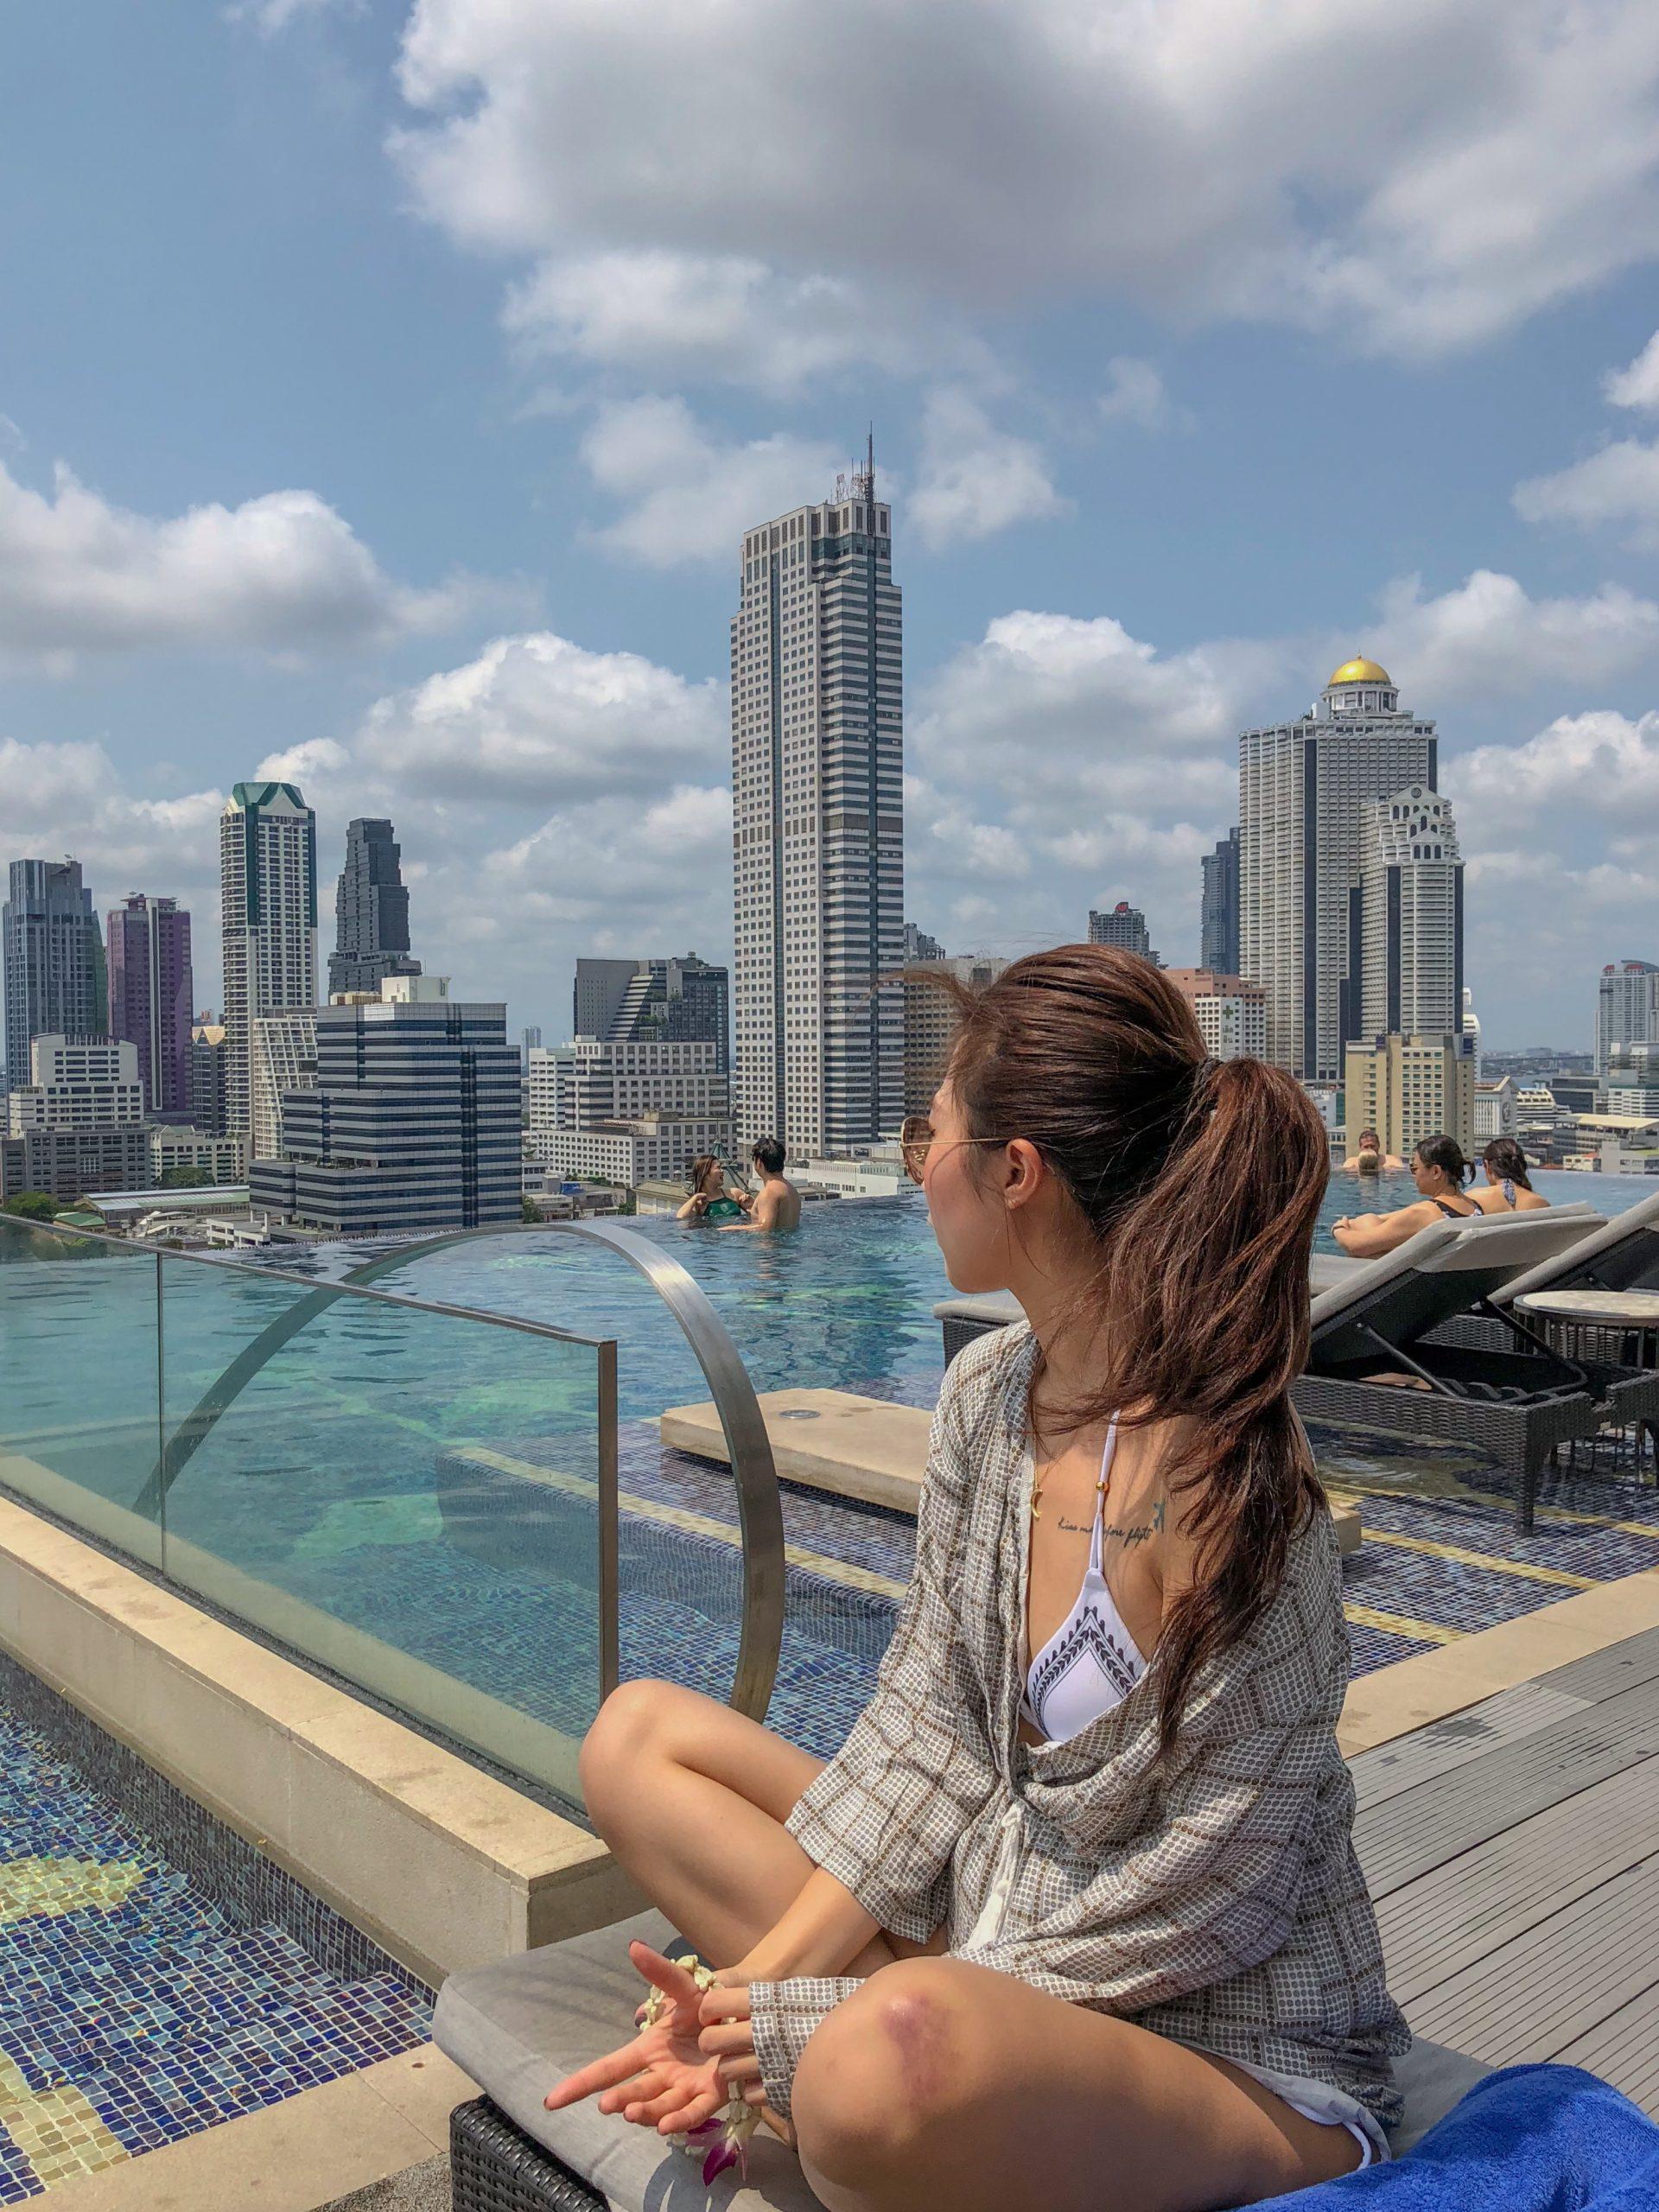 曼谷萬豪|蘇拉翁塞 Bangkok Marriott Hotel 無邊際泳池